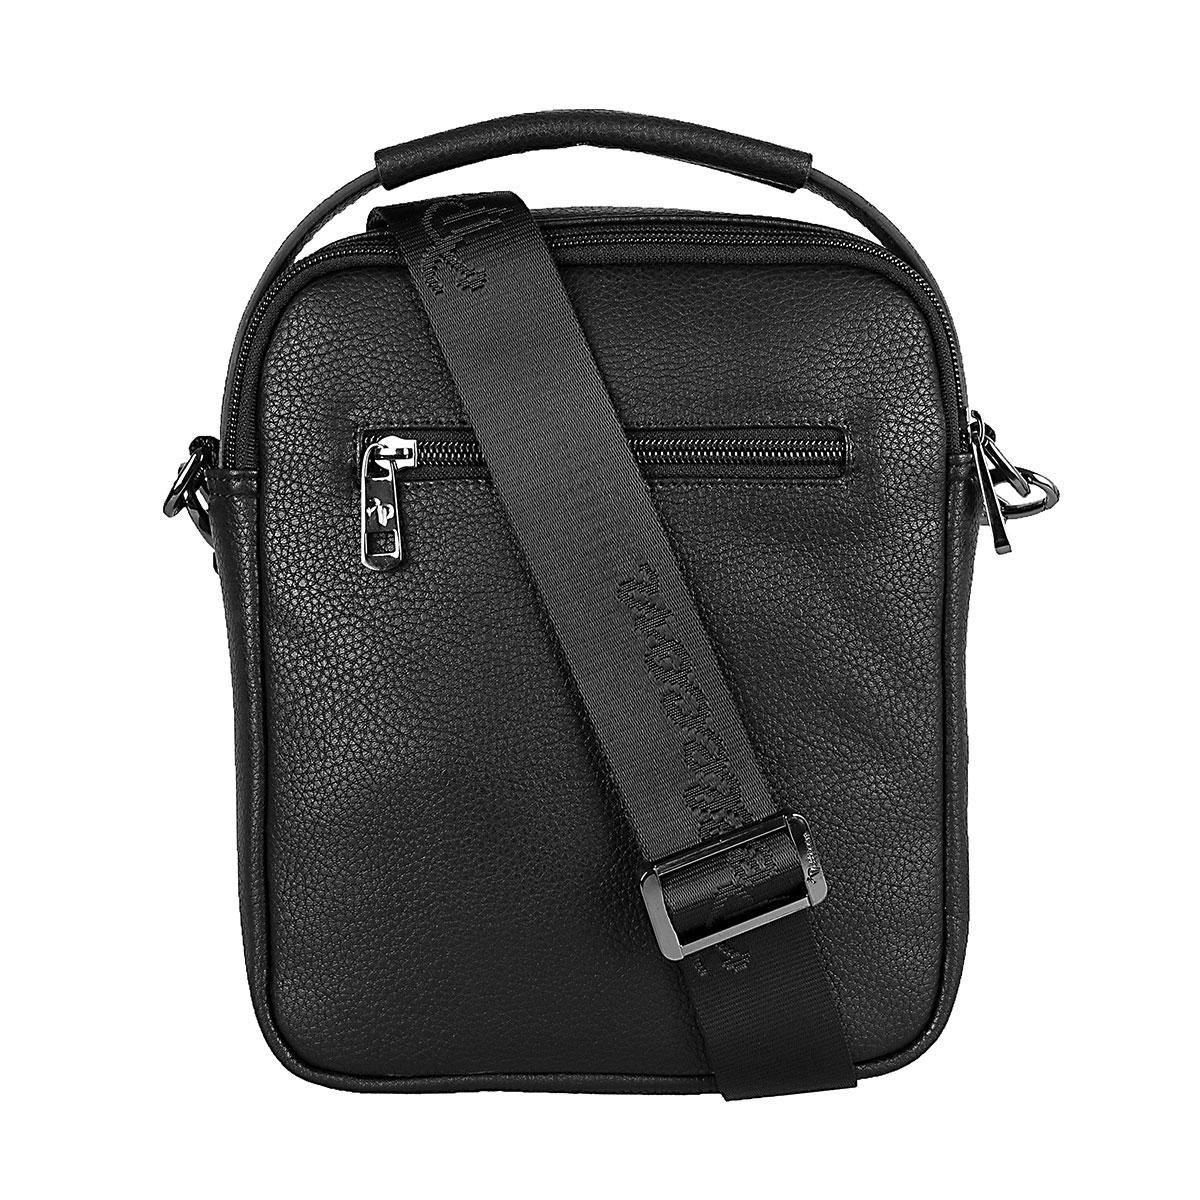 812-81444-1 Men's Bag Pellekon